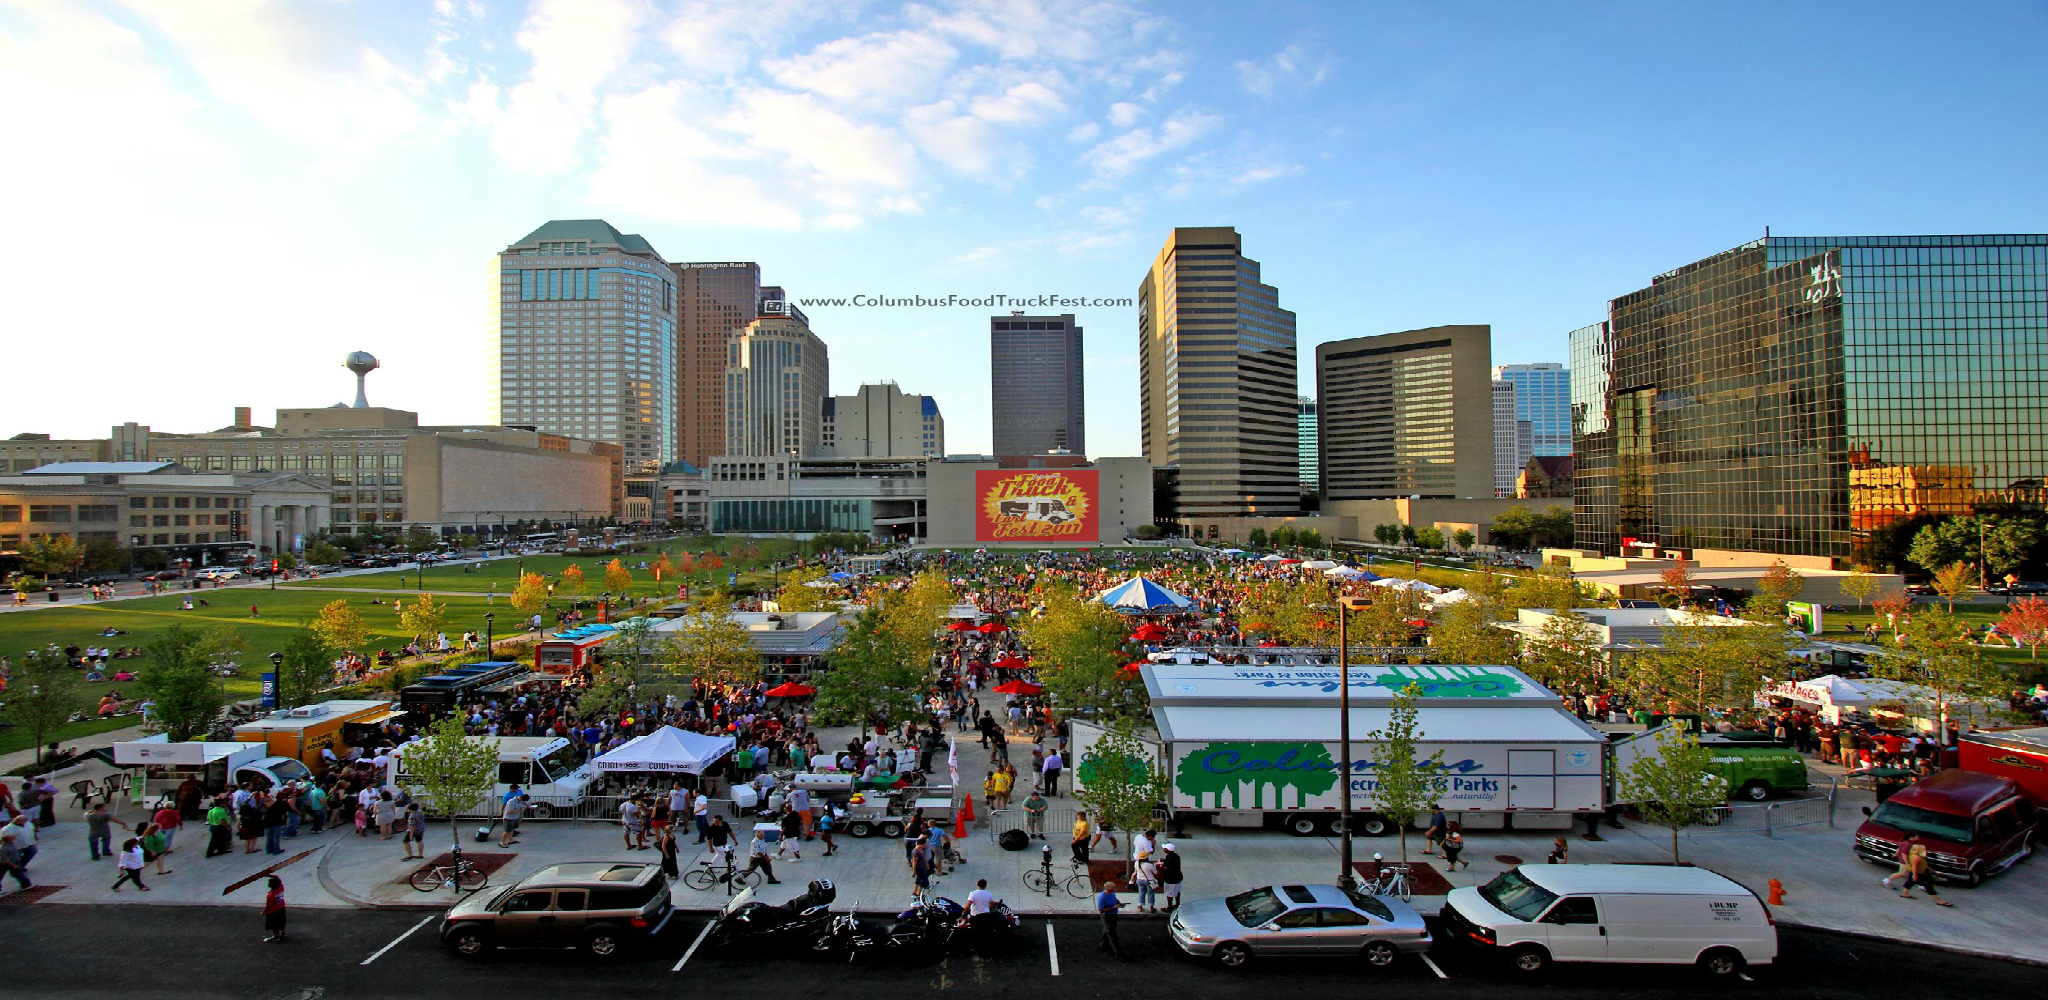 Food Truck Festival  Ohio